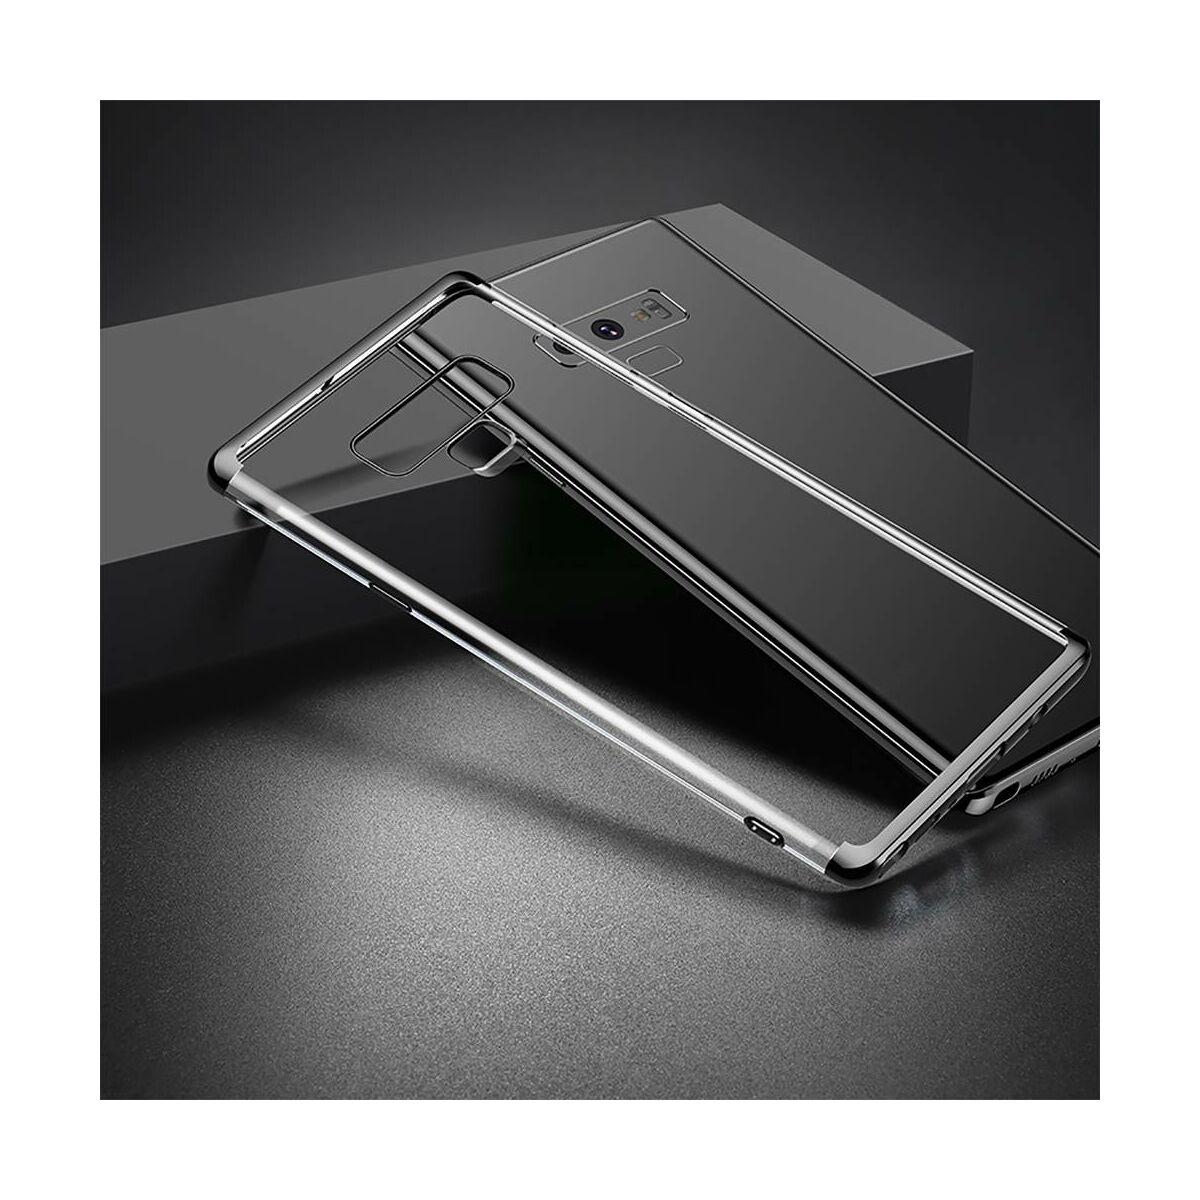 Baseus Samsung Note 9 tok, Shining, fekete (WISANOTE9-MD01)